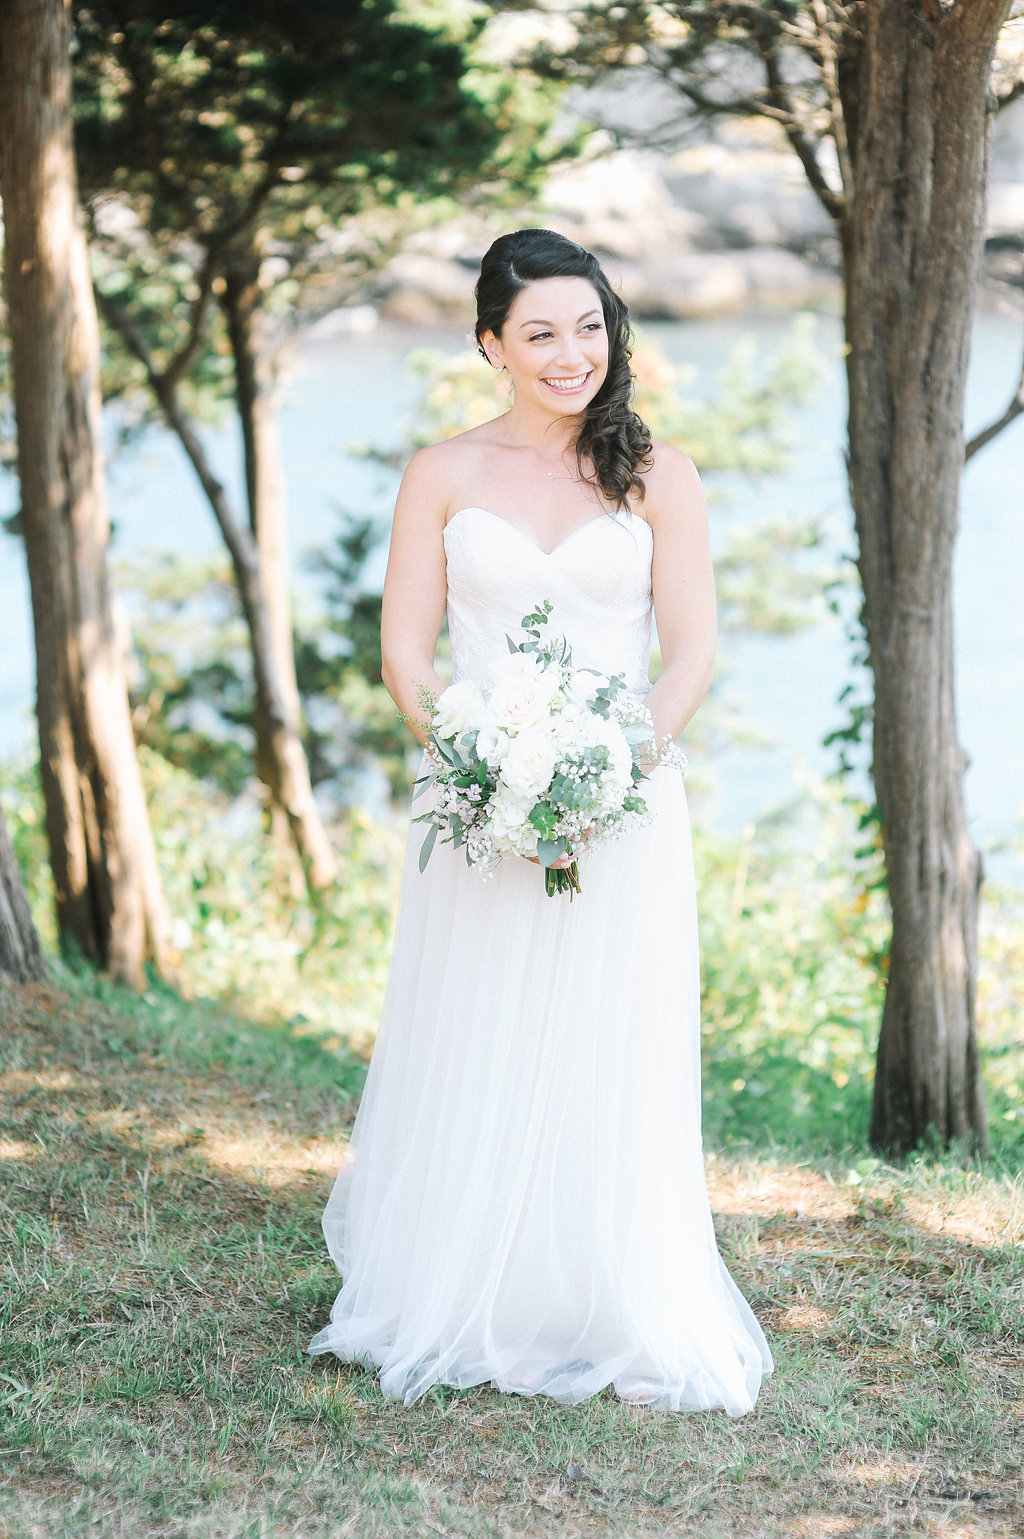 BrideGroomPortraits_Dragonline_Studios_Jamestown_RI_Wedding-48.jpg